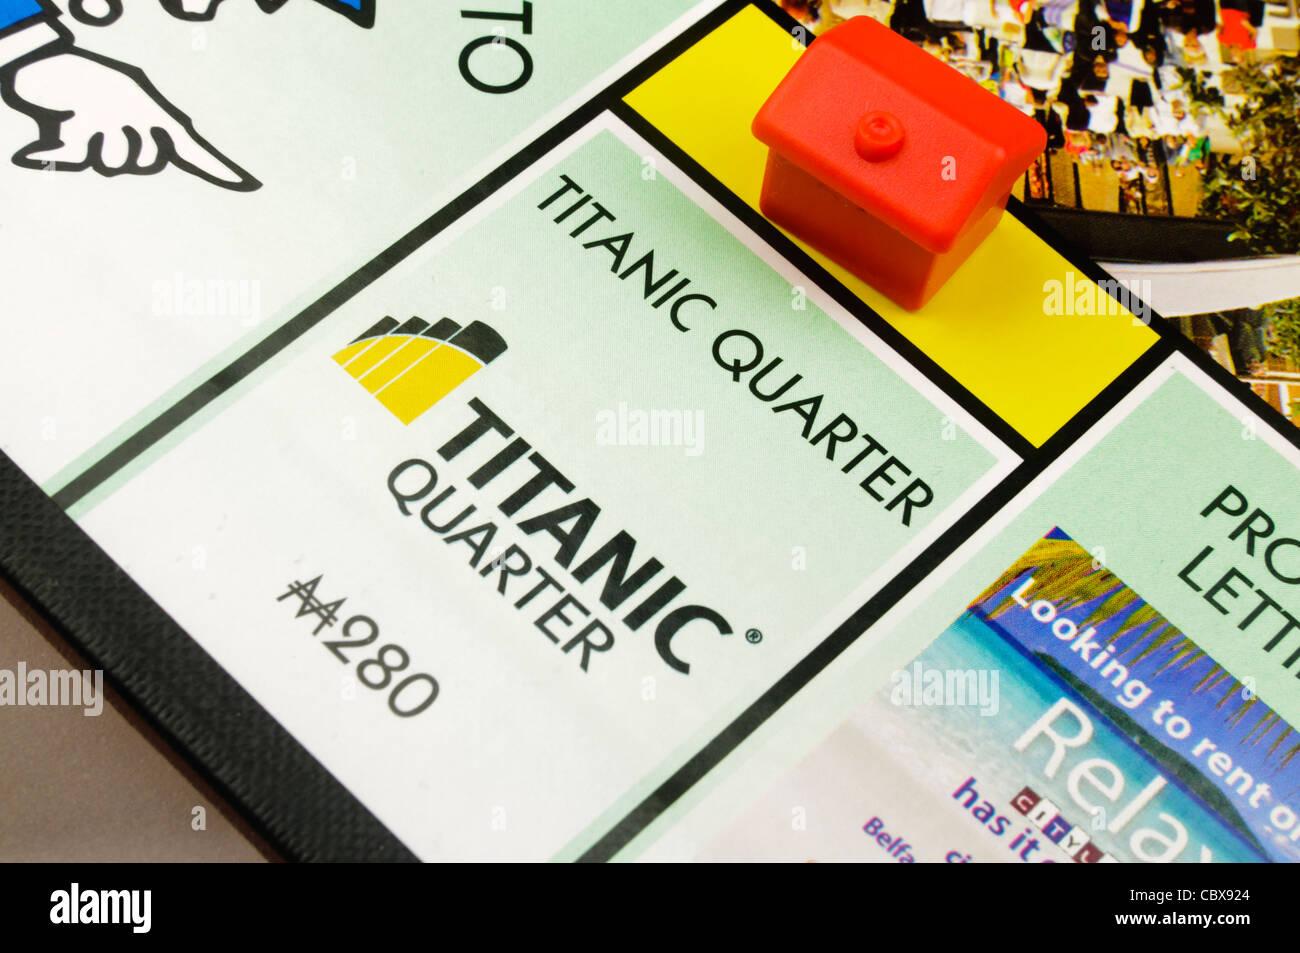 Belfast-Monopol: Bau eines Hotels auf Titanic Quarter Stockbild